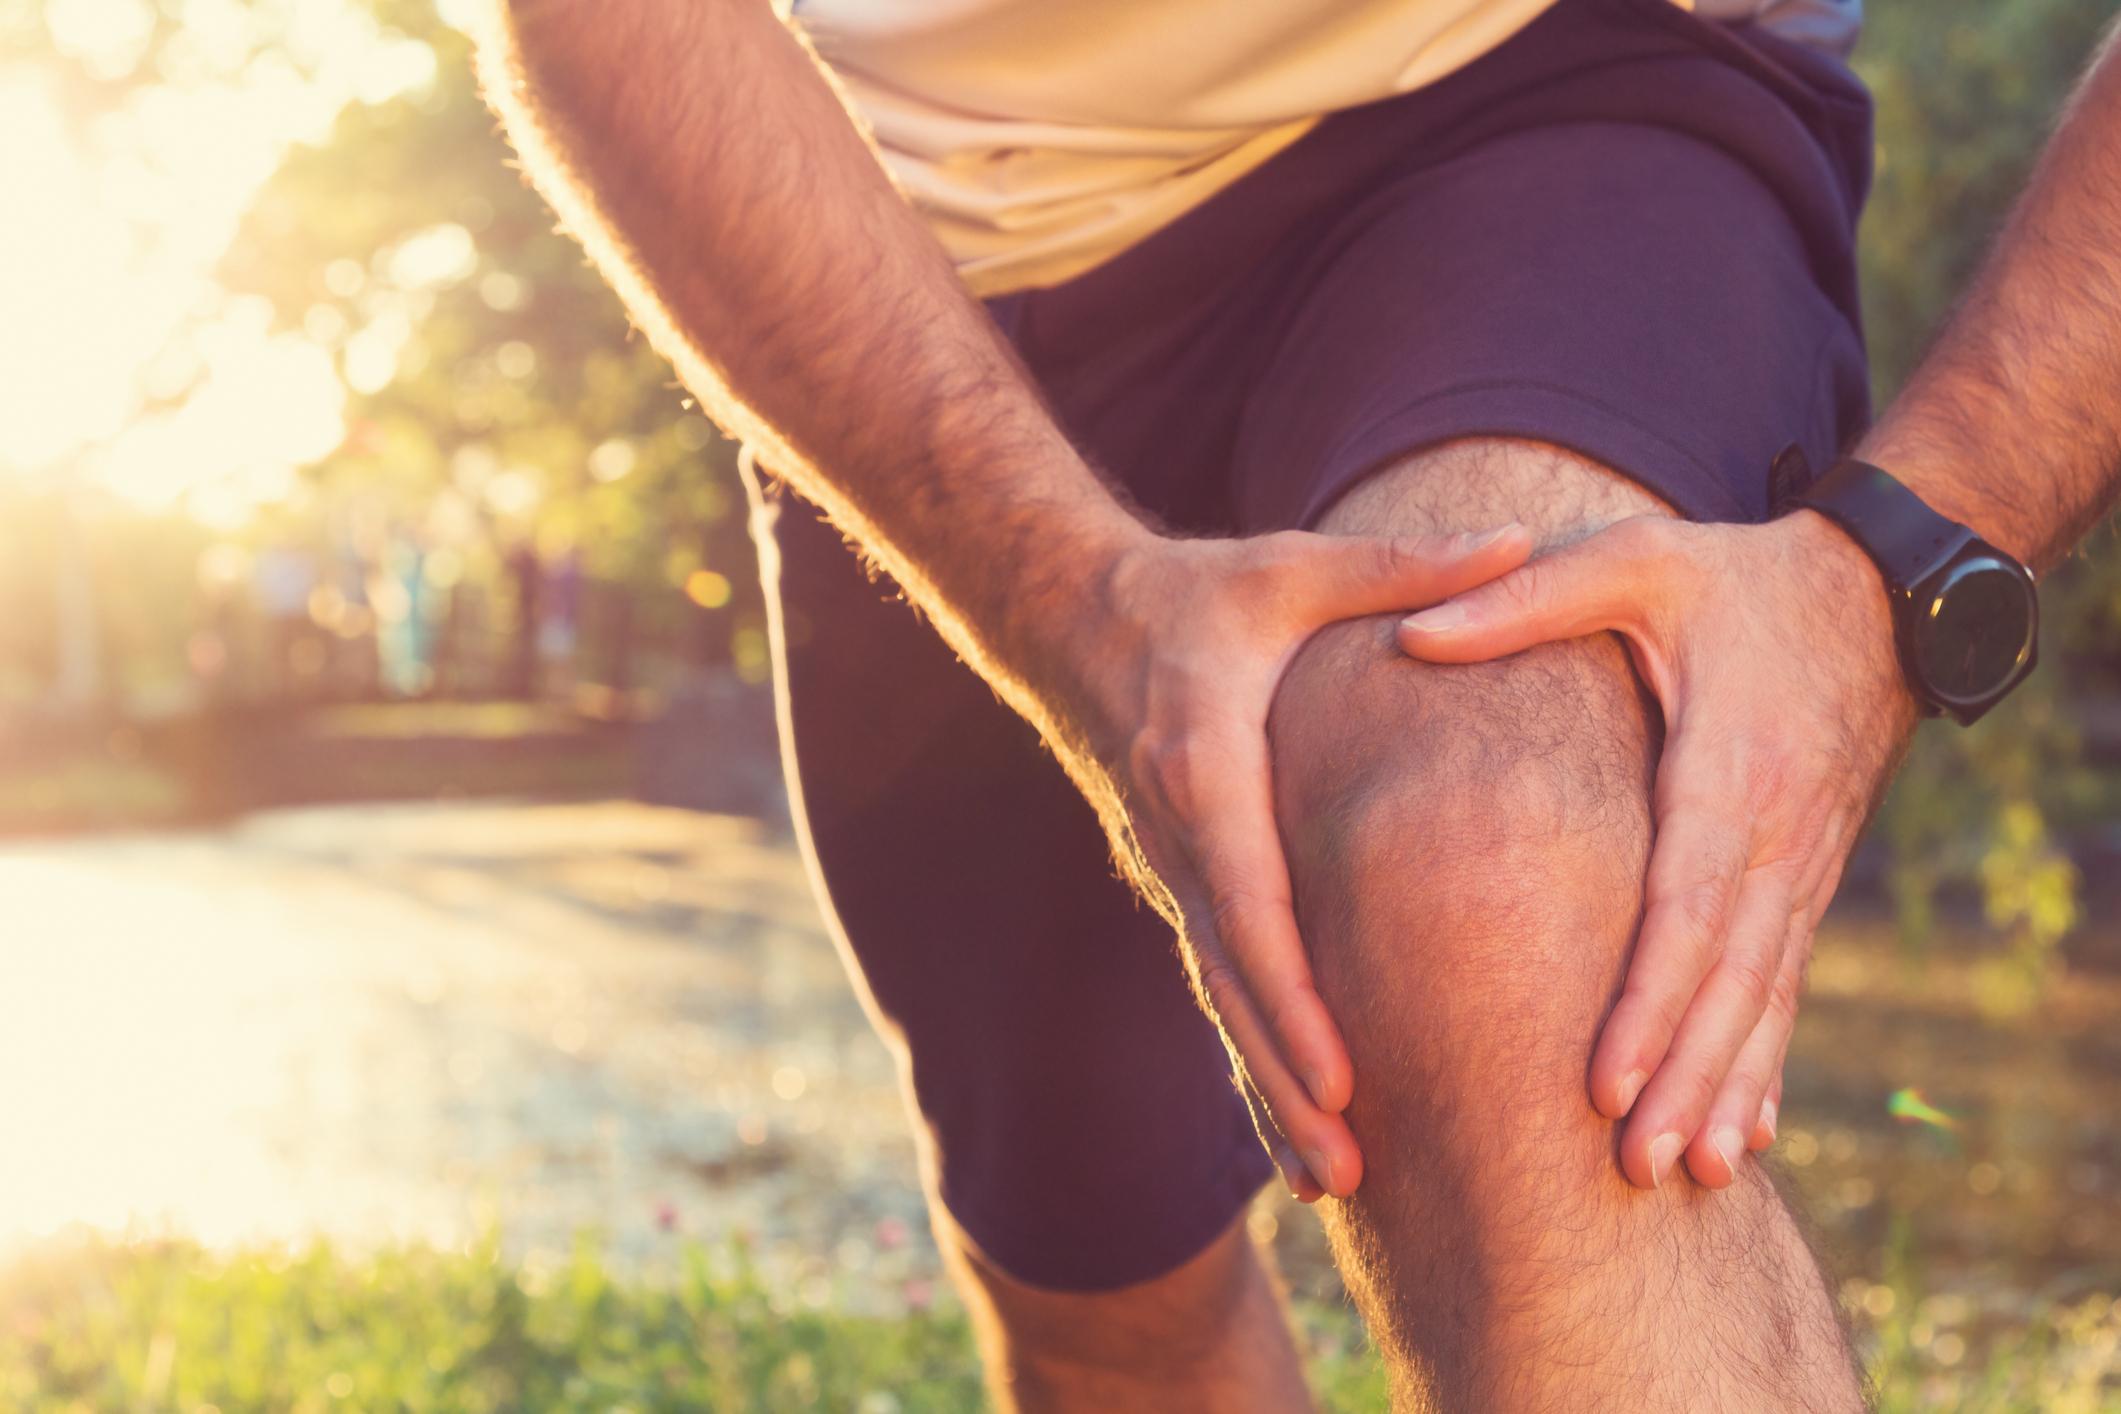 A person rubbing his knee